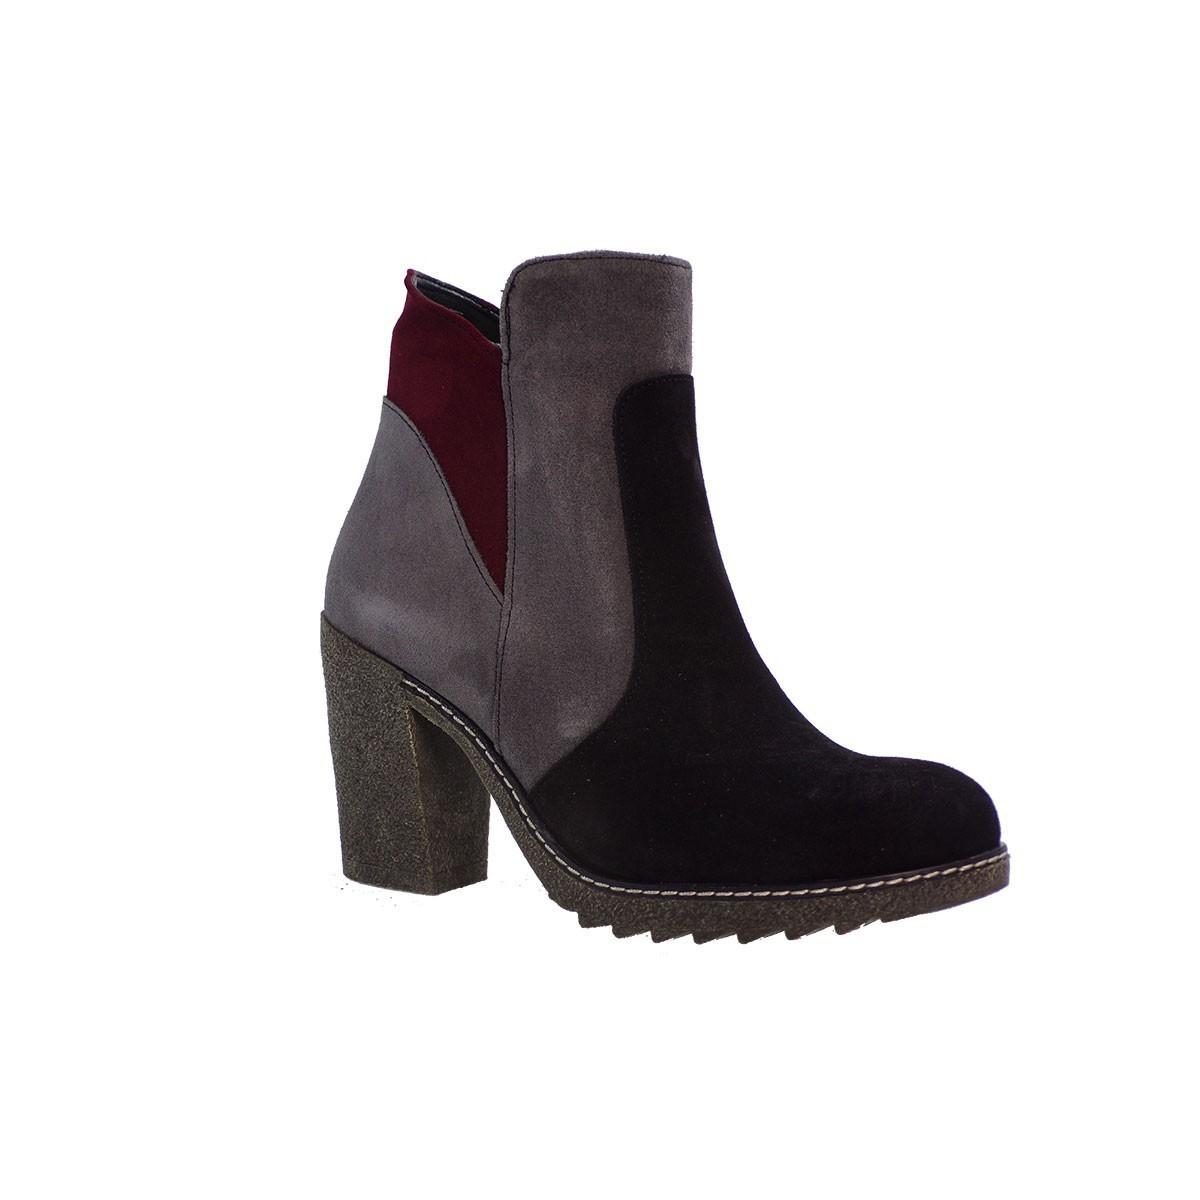 SMART CRONOS Γυναικεία Παπούτσια Mποτάκια 6695/GARD Μαύρο-Γκρί Δέρμα Καστόρι